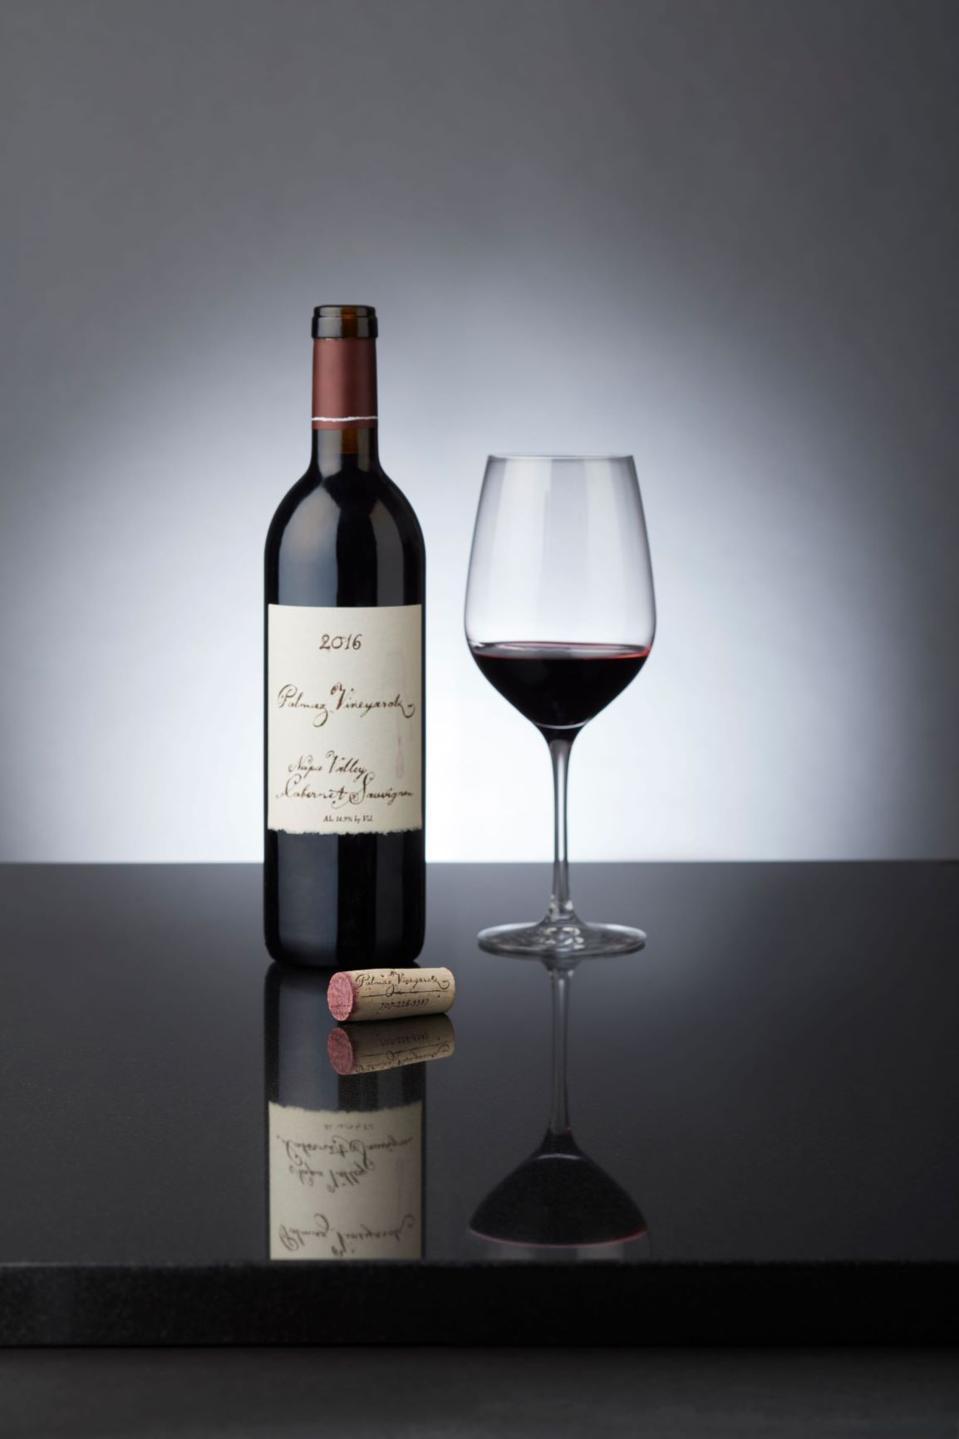 This Palmaz Vineyards Cabernet Sauvignon is a perfect gift.